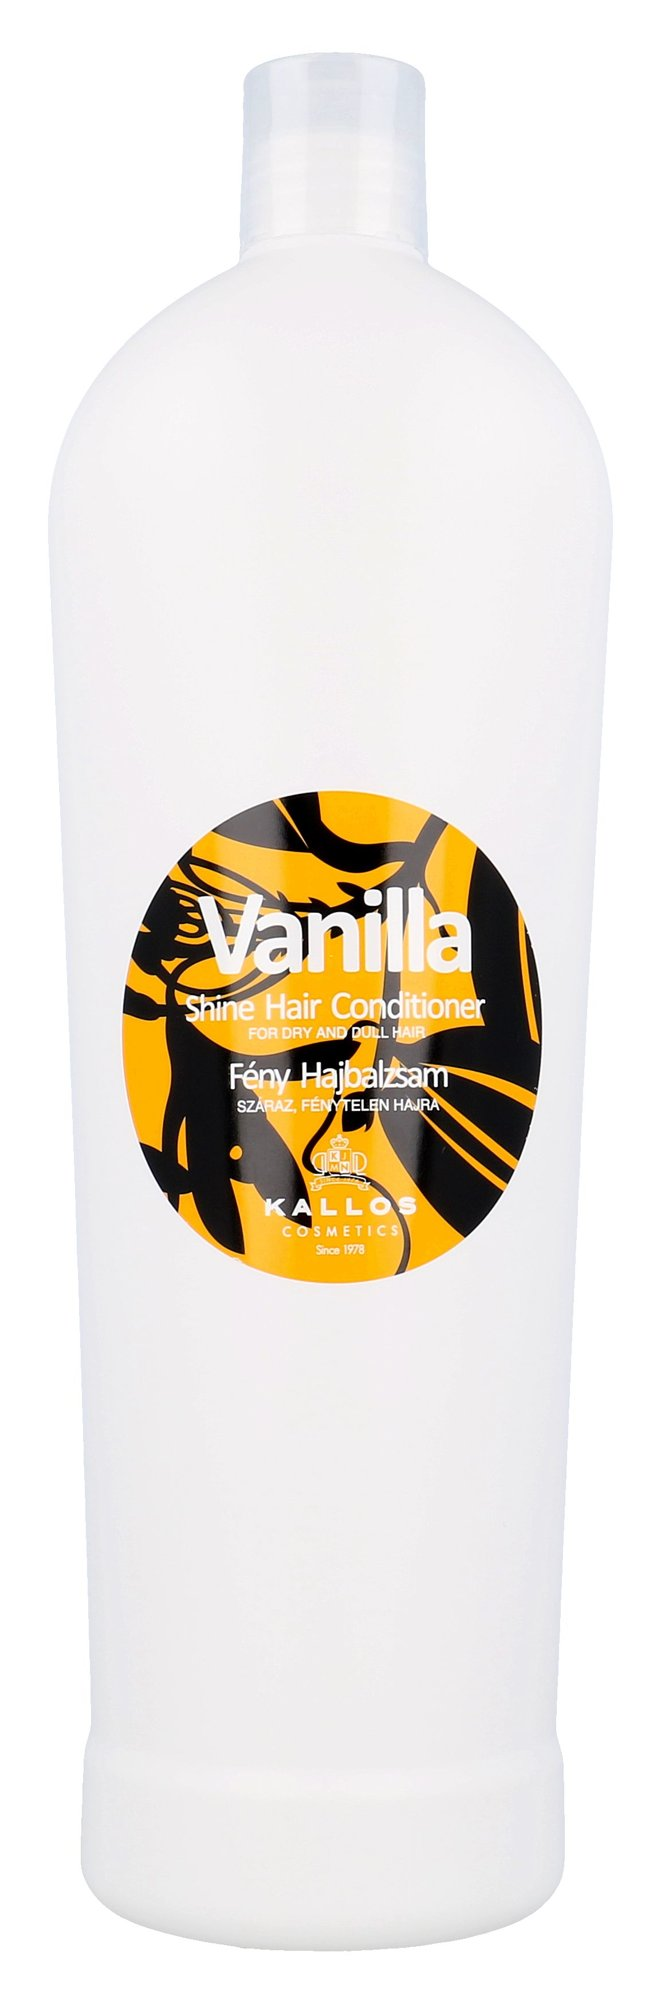 Plaukų kondicionierius Kallos Cosmetics Vanilla